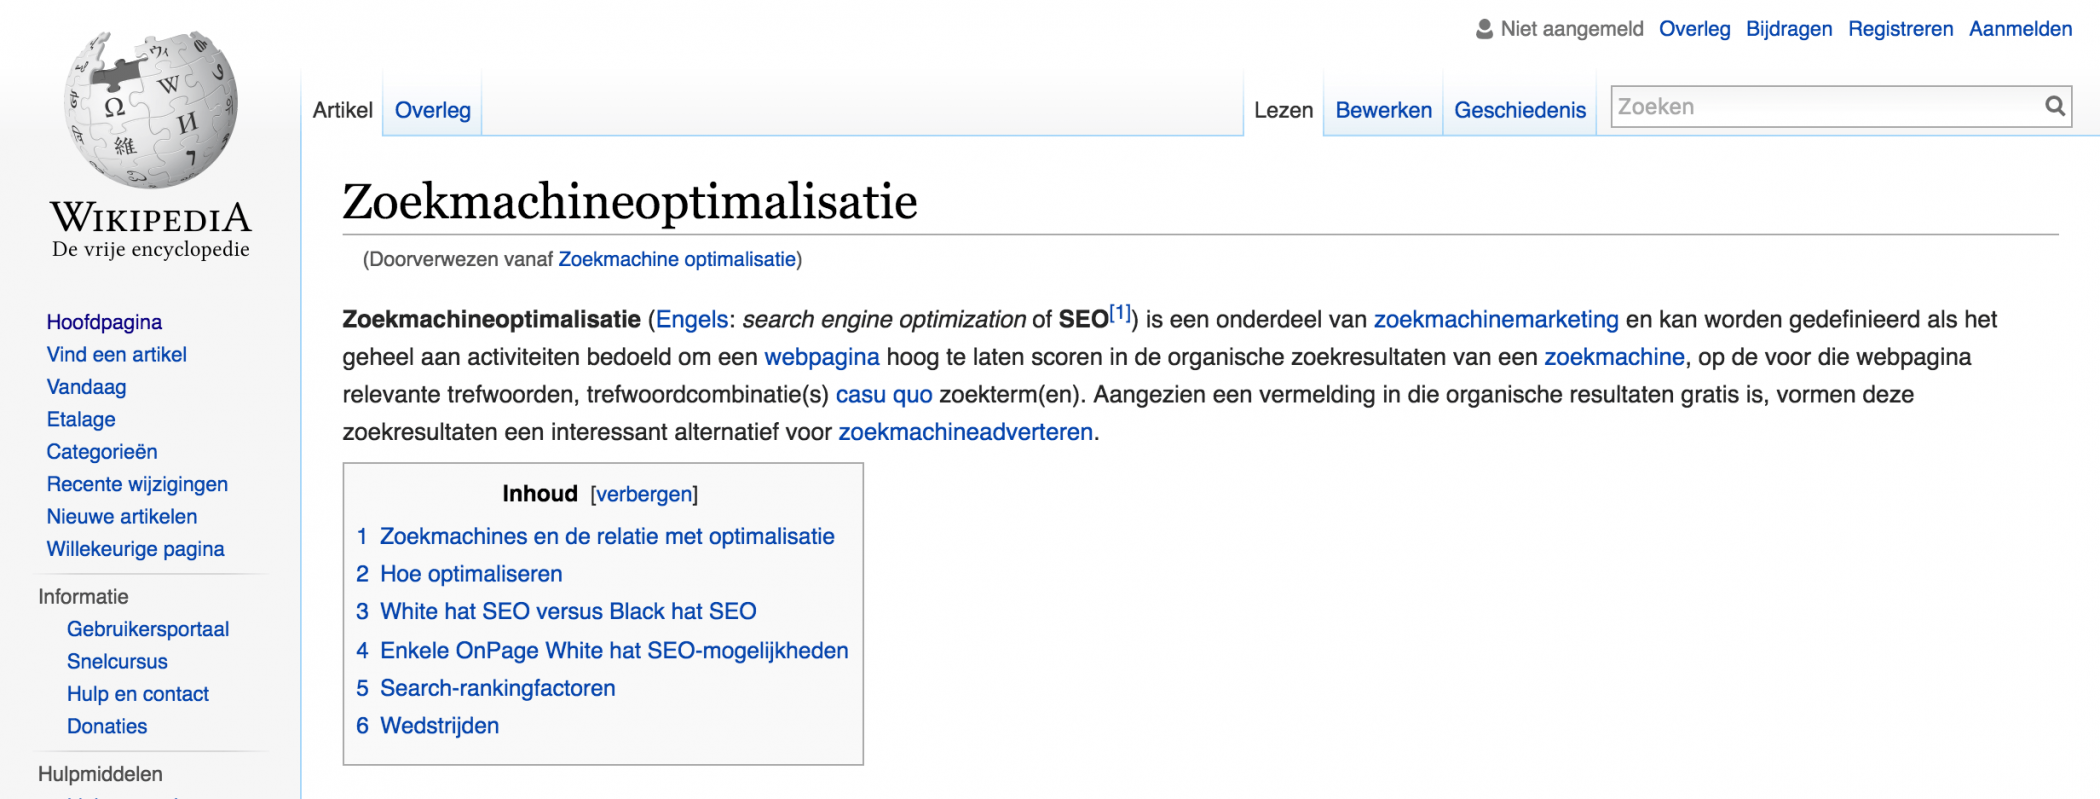 interne-links-wikipedia-structuur